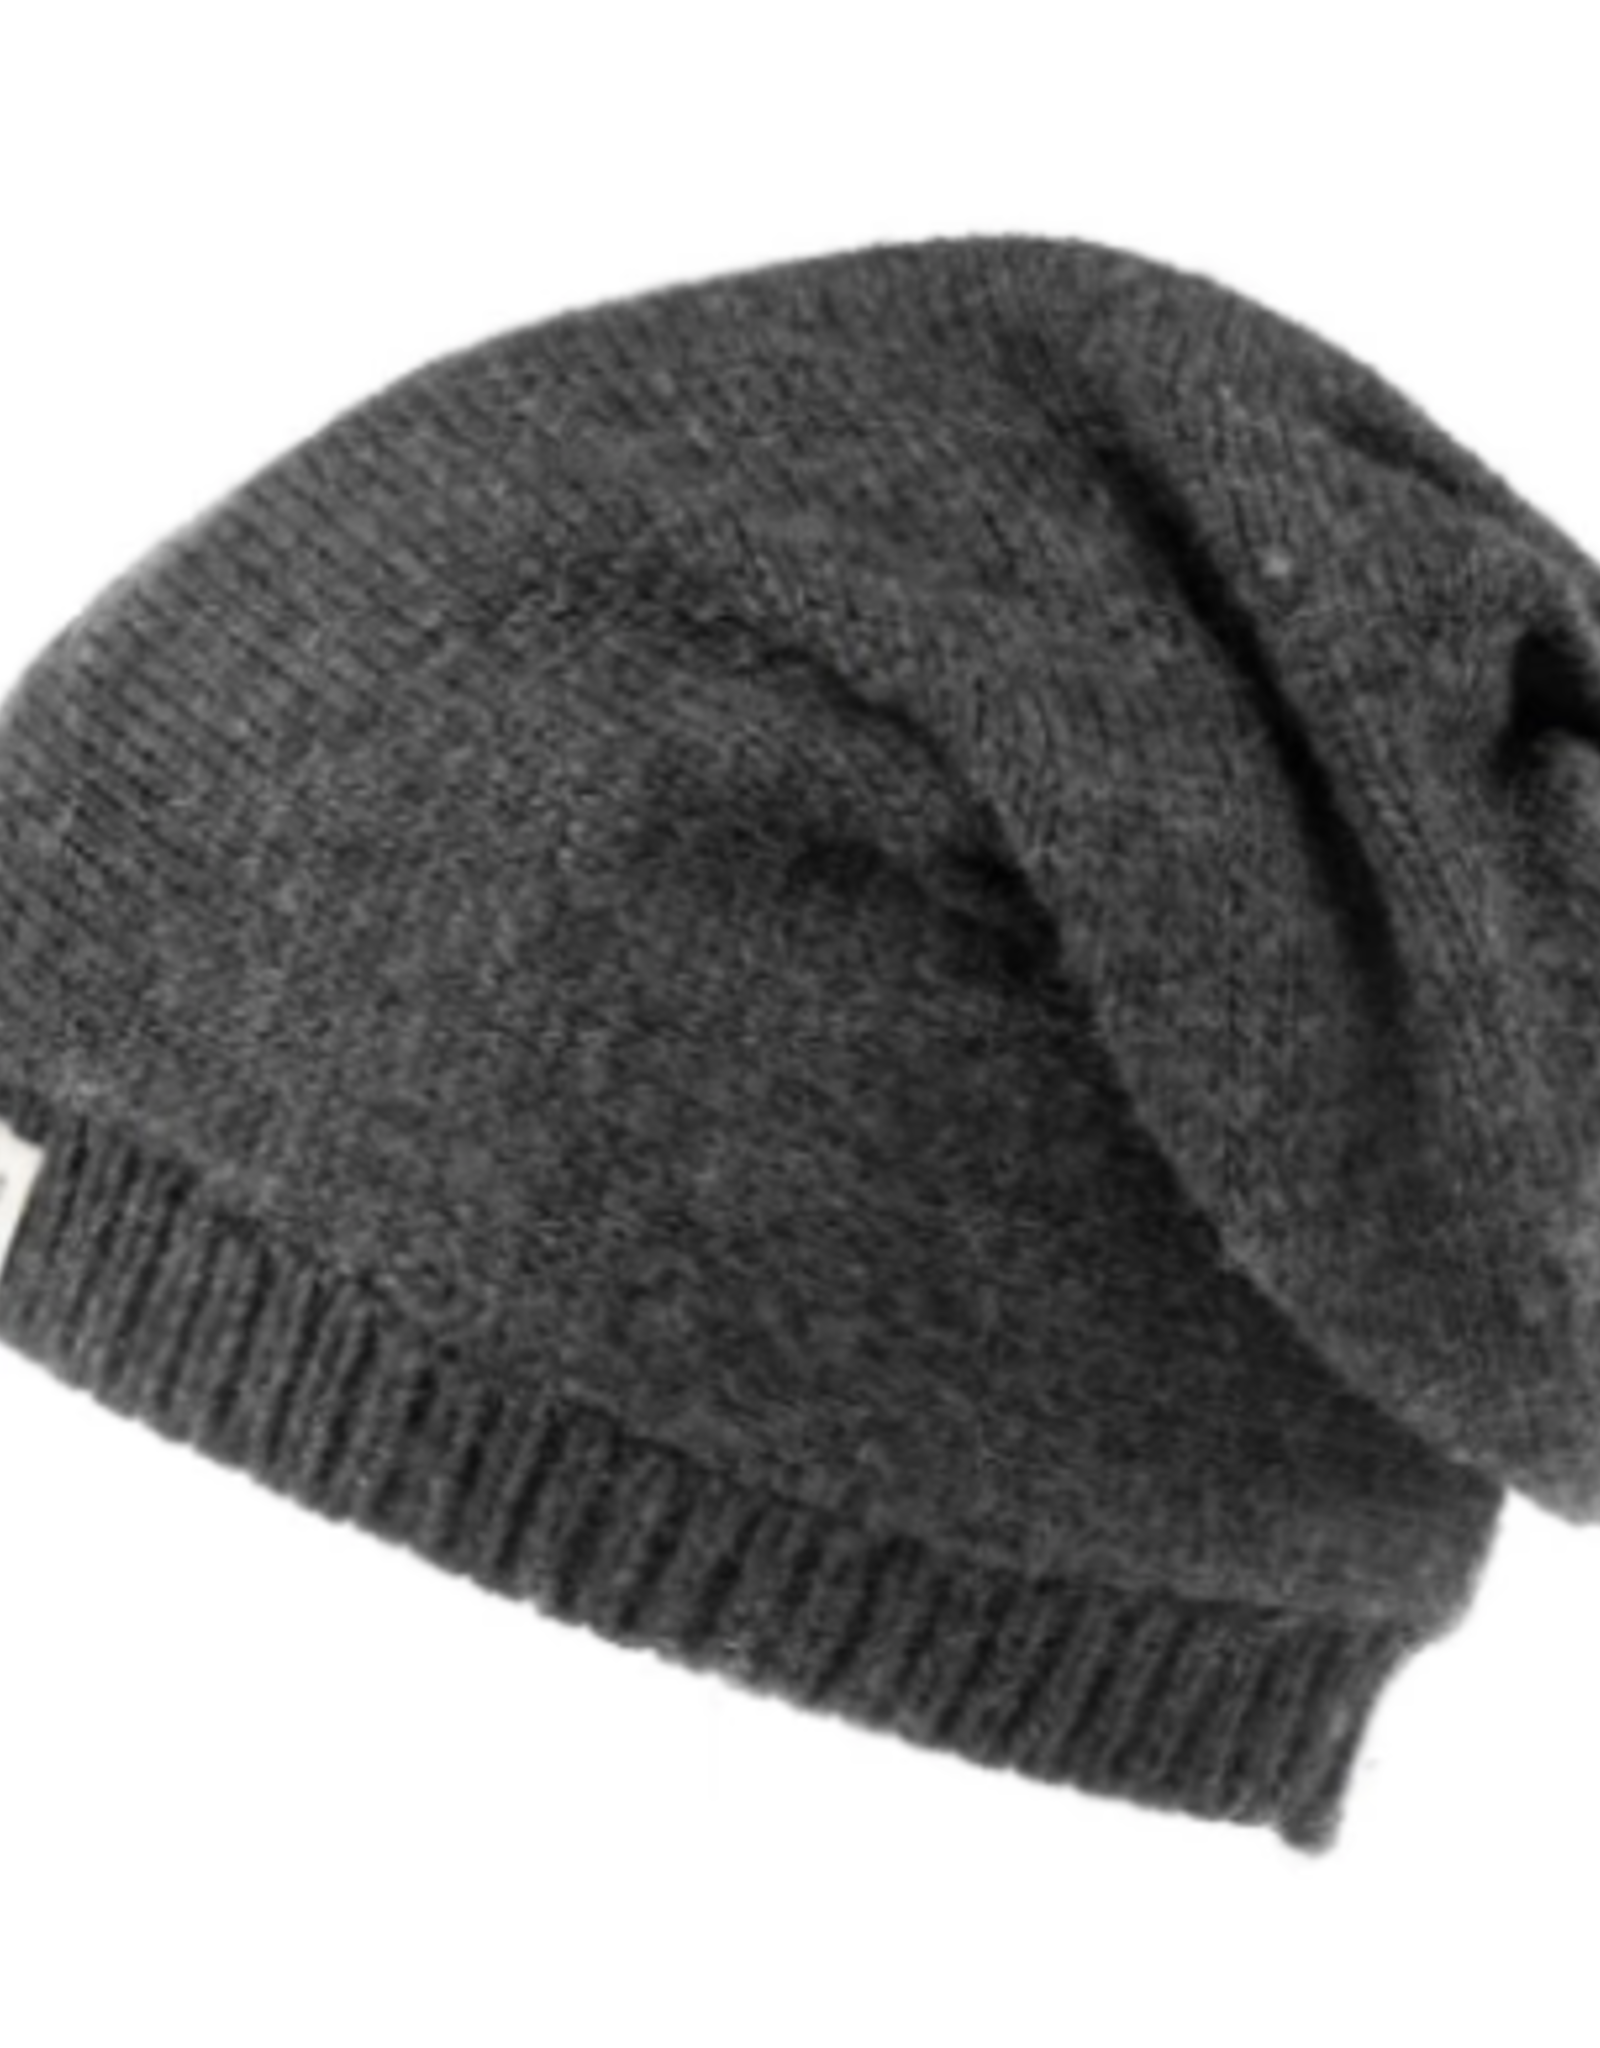 HAT-BEANIE-SLOUCH-DEKALB